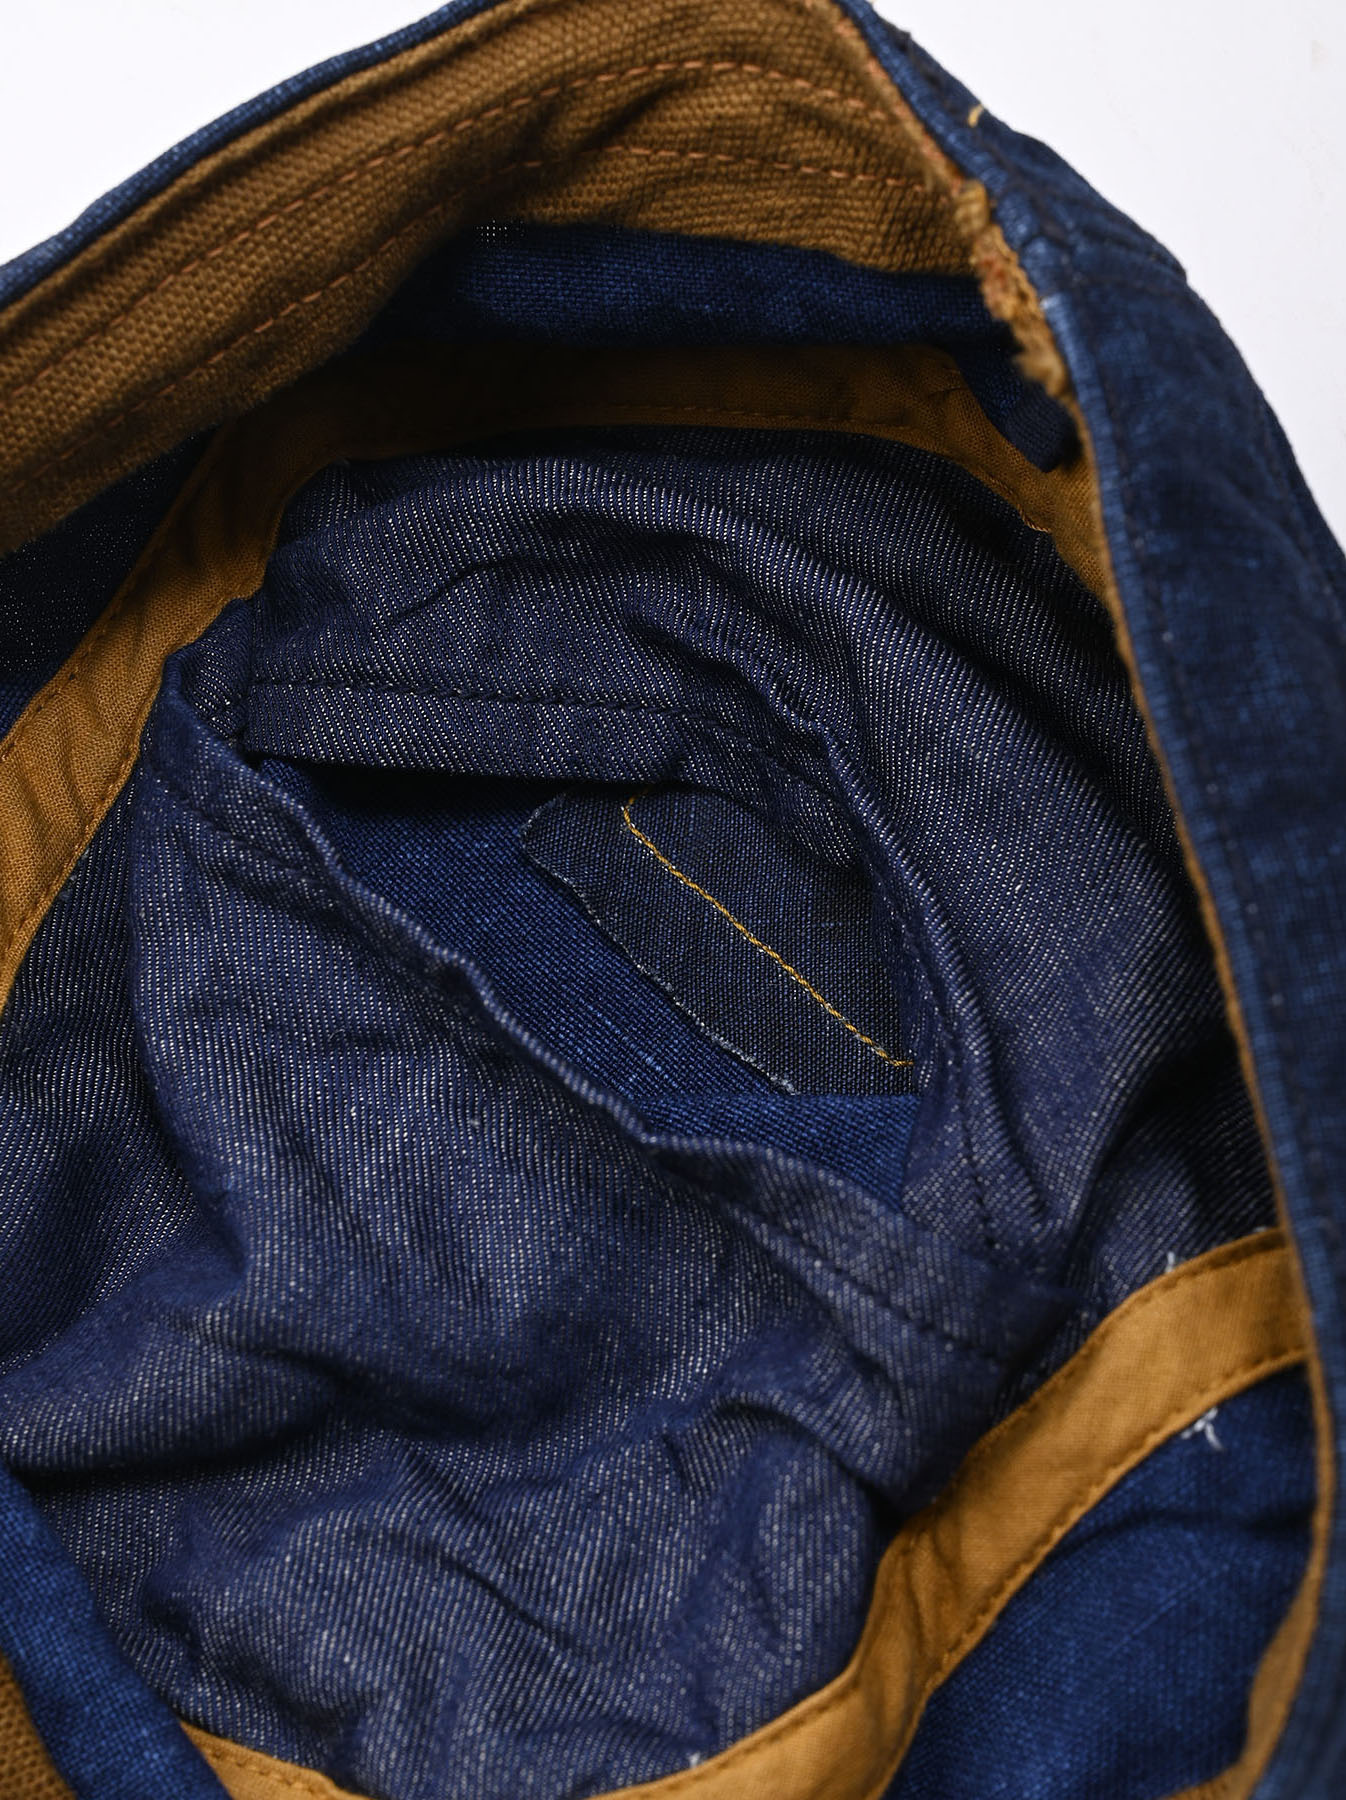 Indigo Linen Duck Work Cap (0421)-9